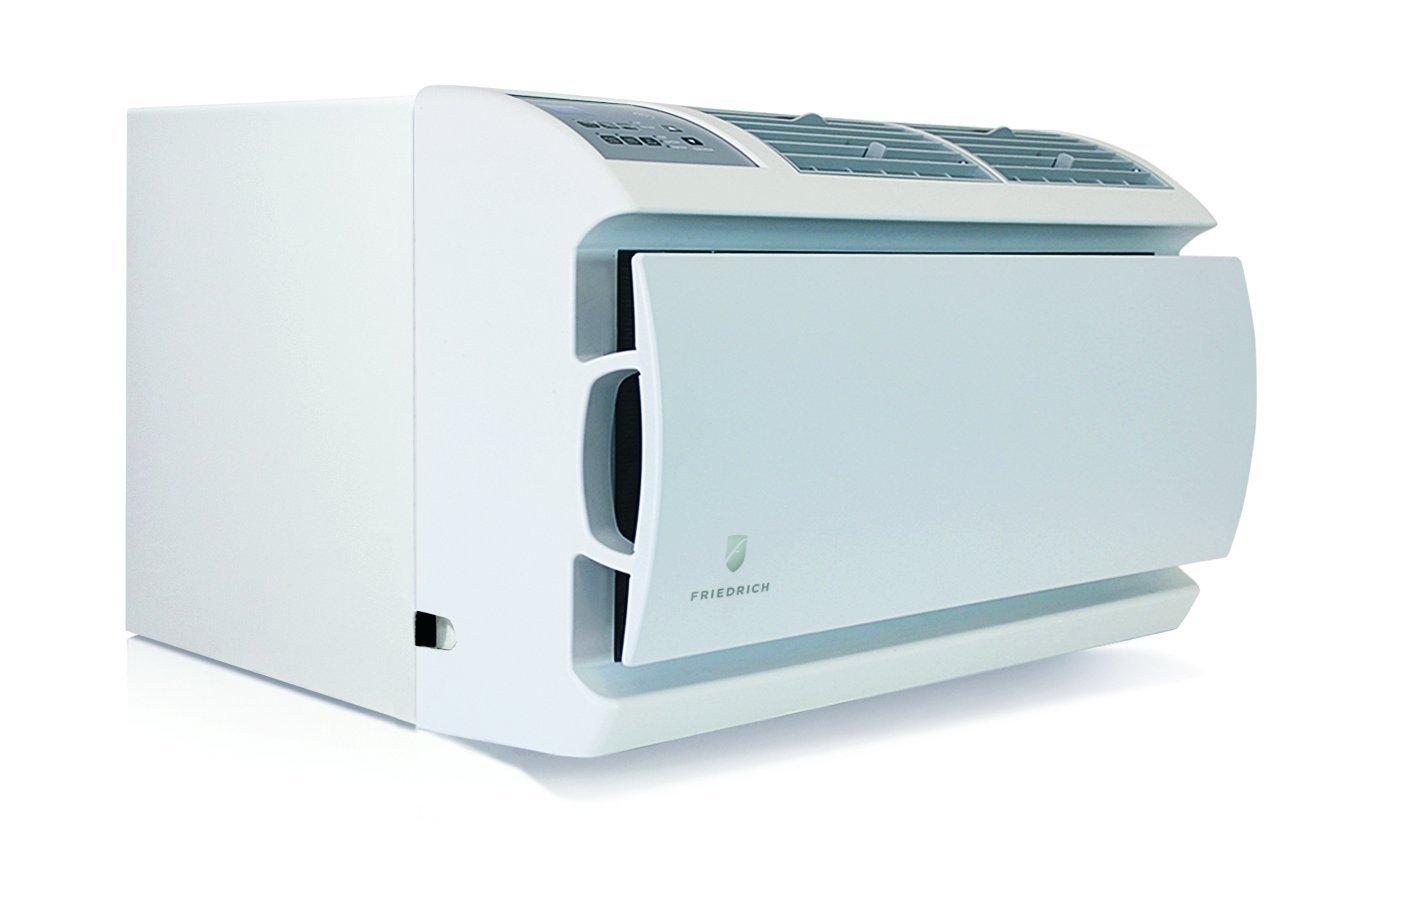 Friedrich 12000 Btu 98 Eer Wall Master Series Room Air Conditioners Wiring Diagram Conditioner 115 Volt Home Kitchen